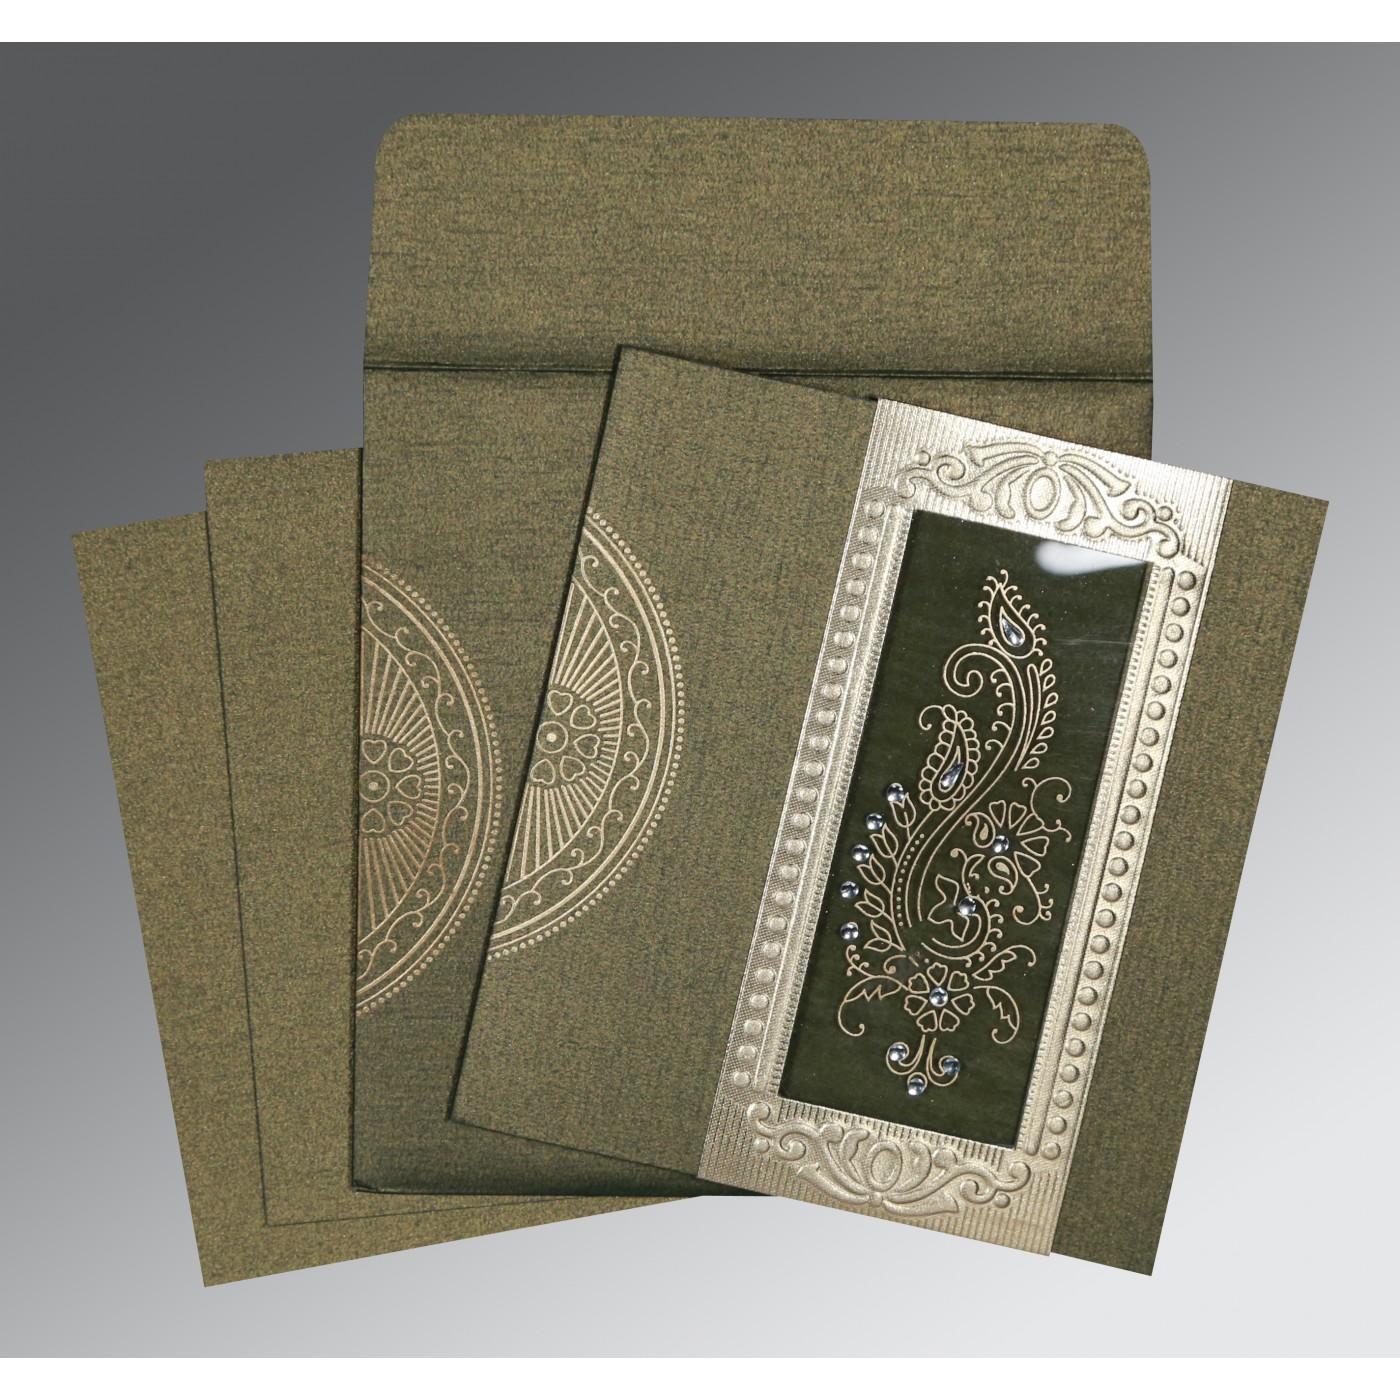 DEEP GREEN SHIMMERY FOIL STAMPED WEDDING INVITATION : C-8230L - 123WeddingCards